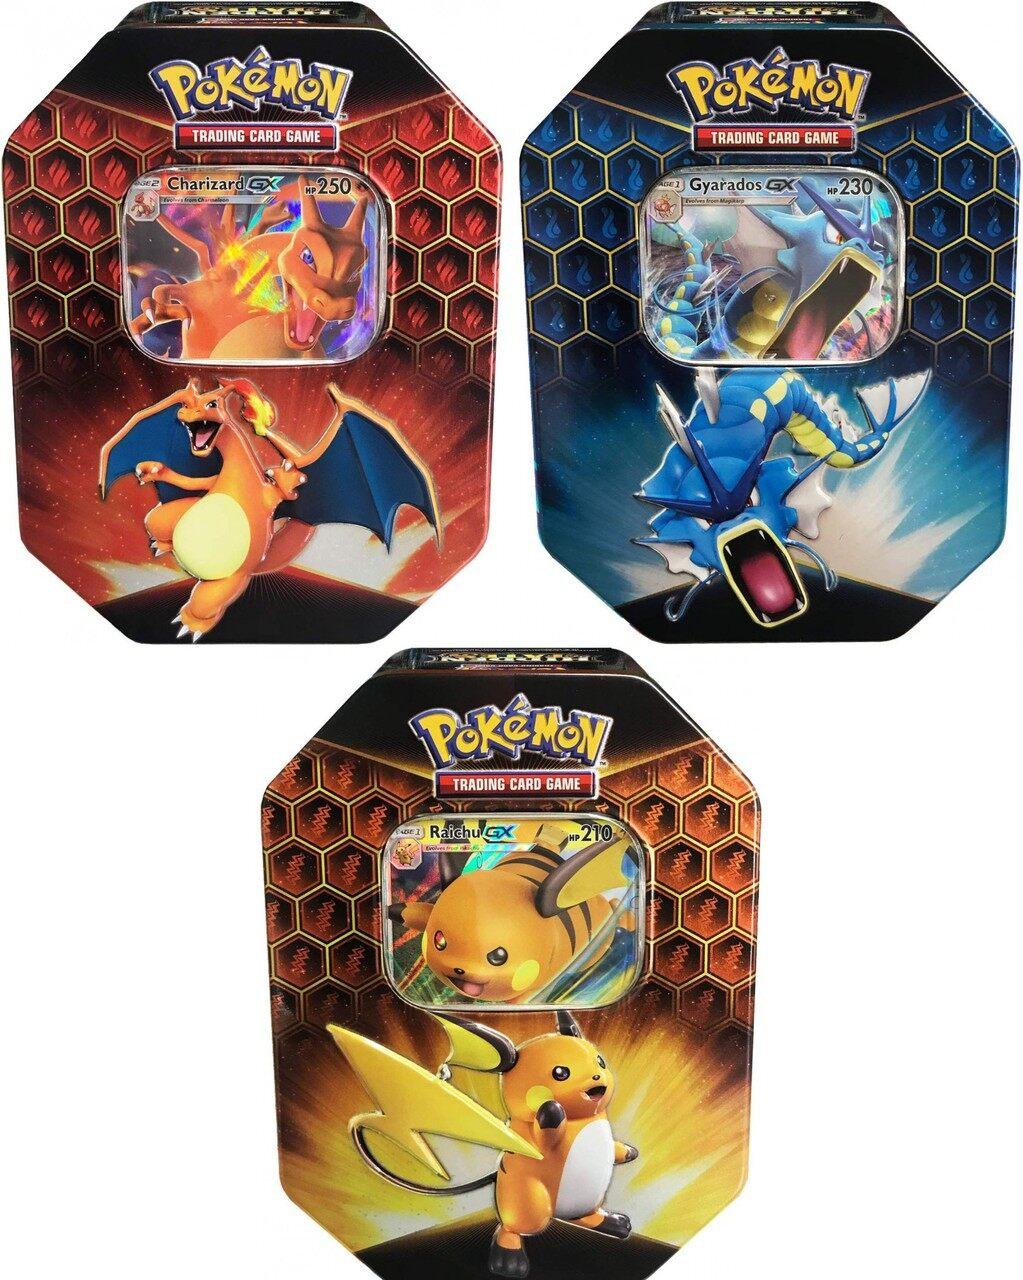 Pokemon TCG Hidden Fates Tins All 3 included Gyarados and Raichu Charizard